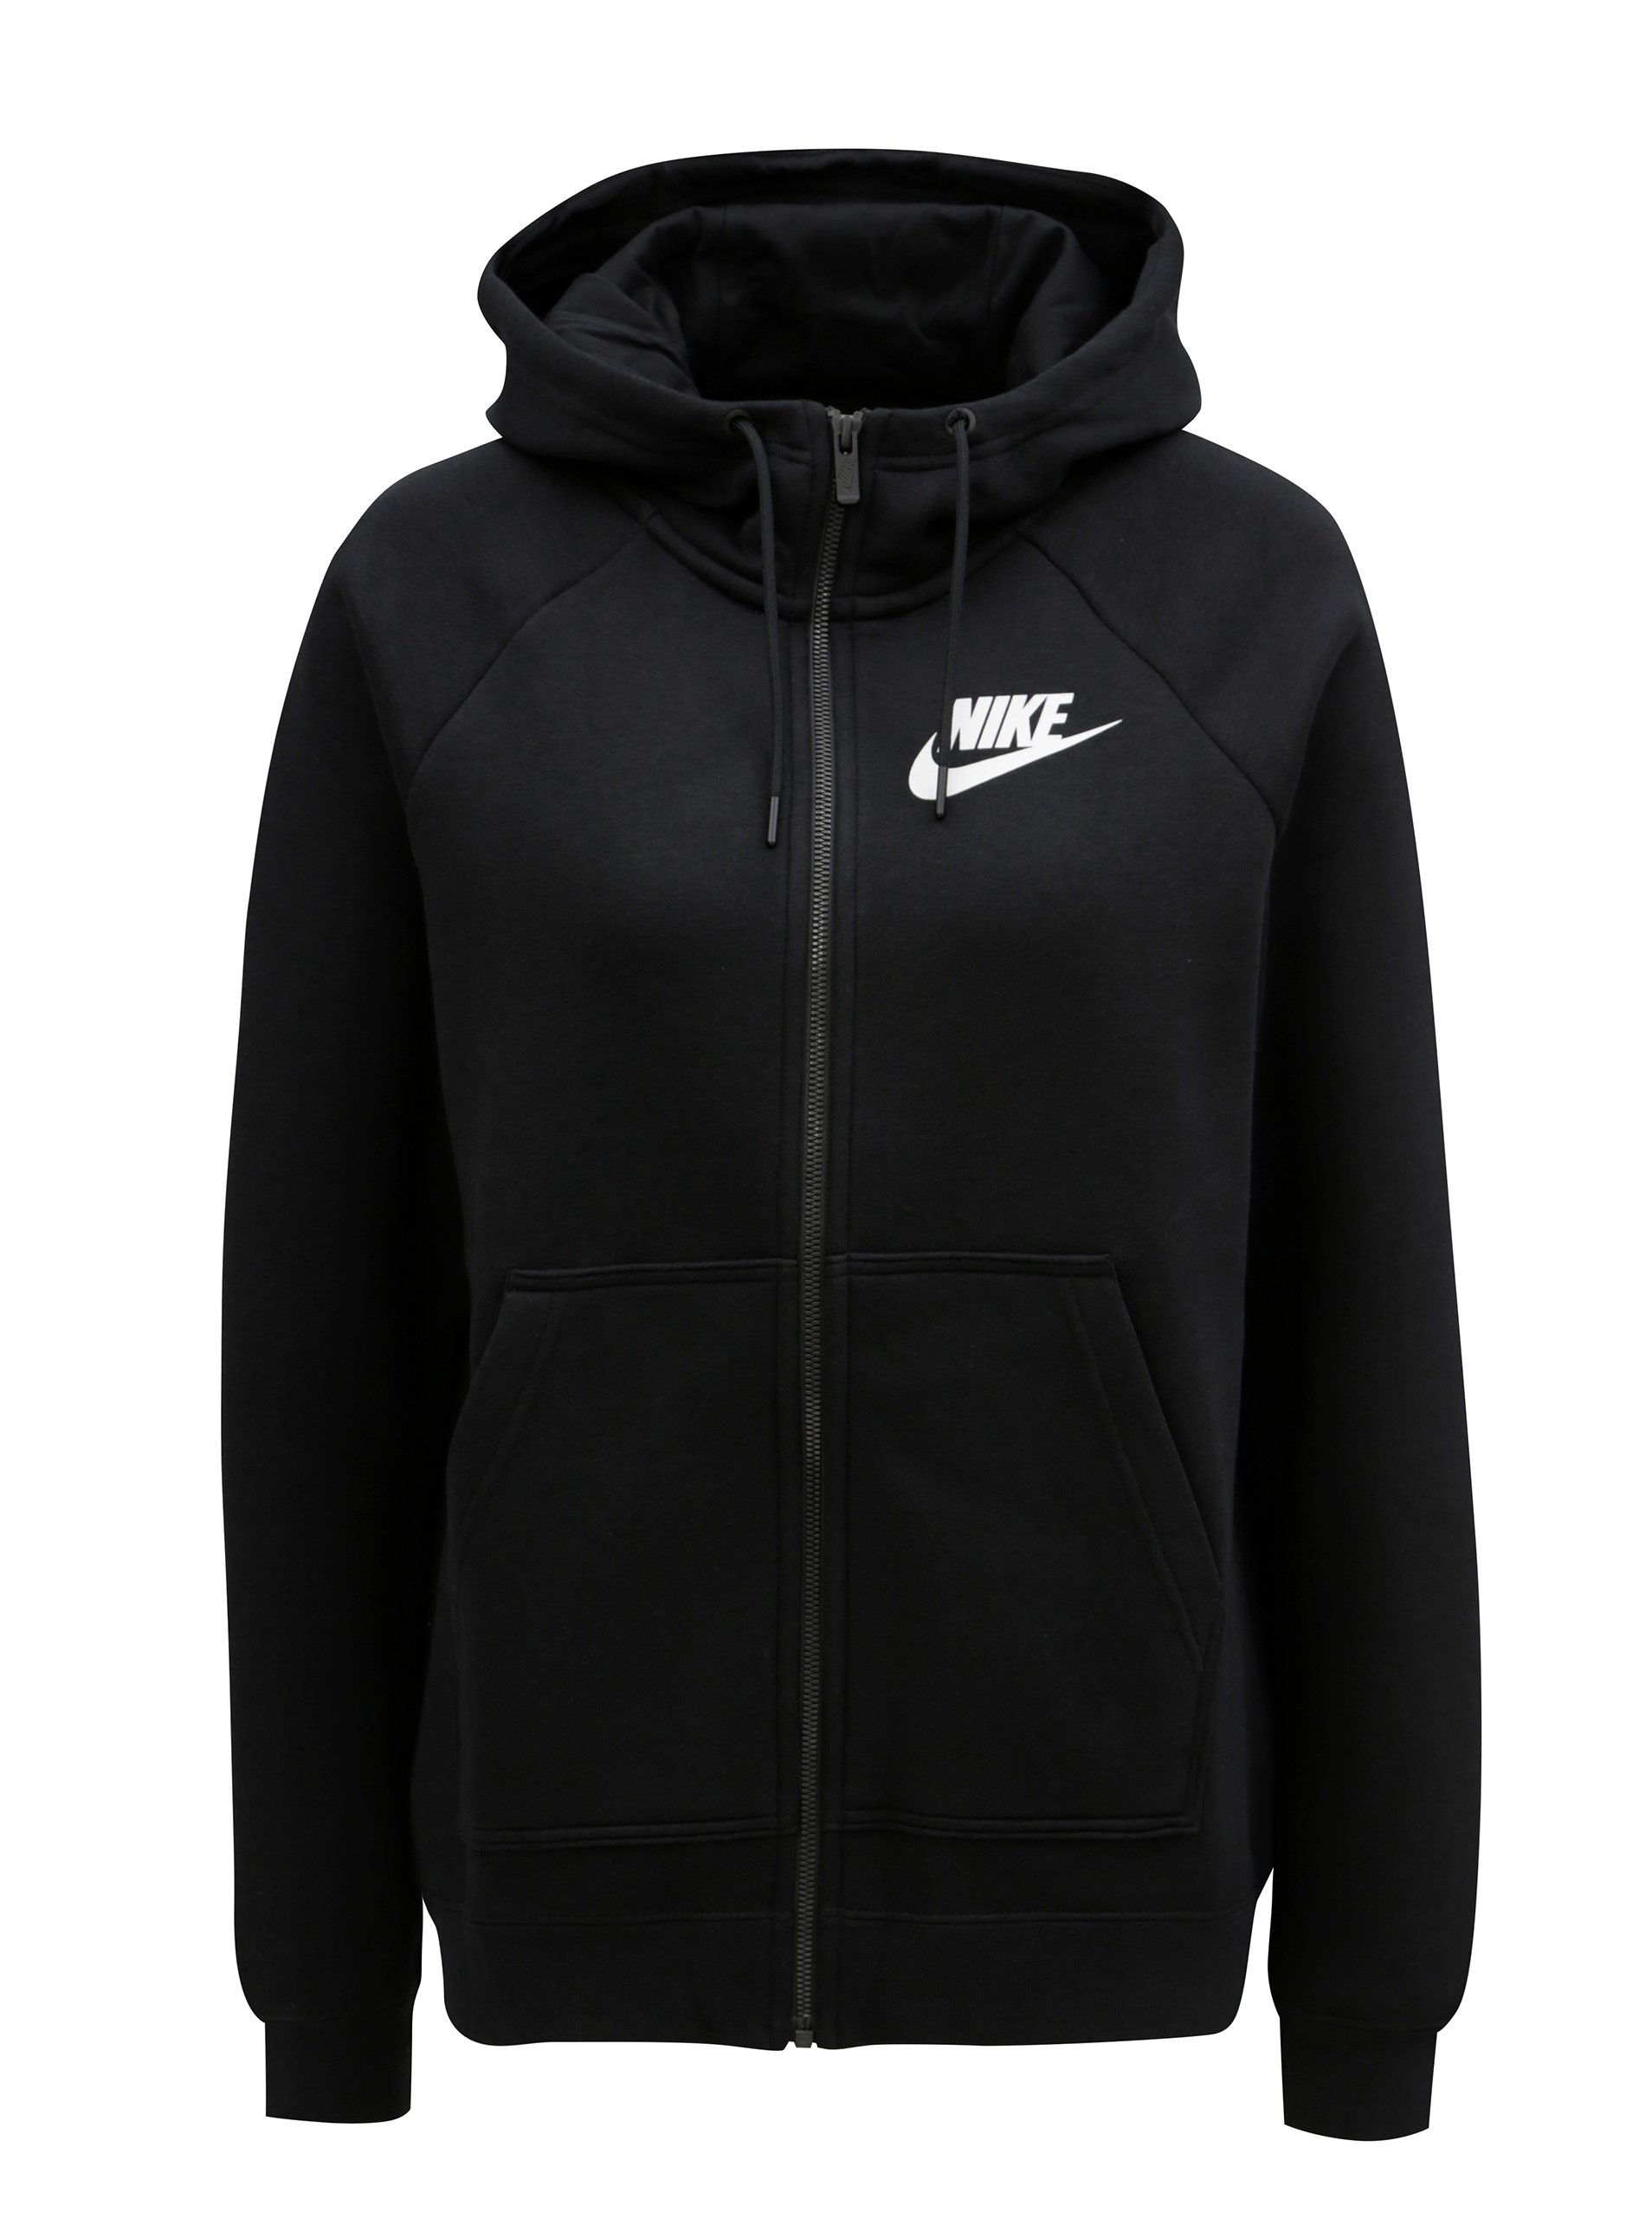 89b64fc8b36b Čierna dámska mikina na zips Nike Rally